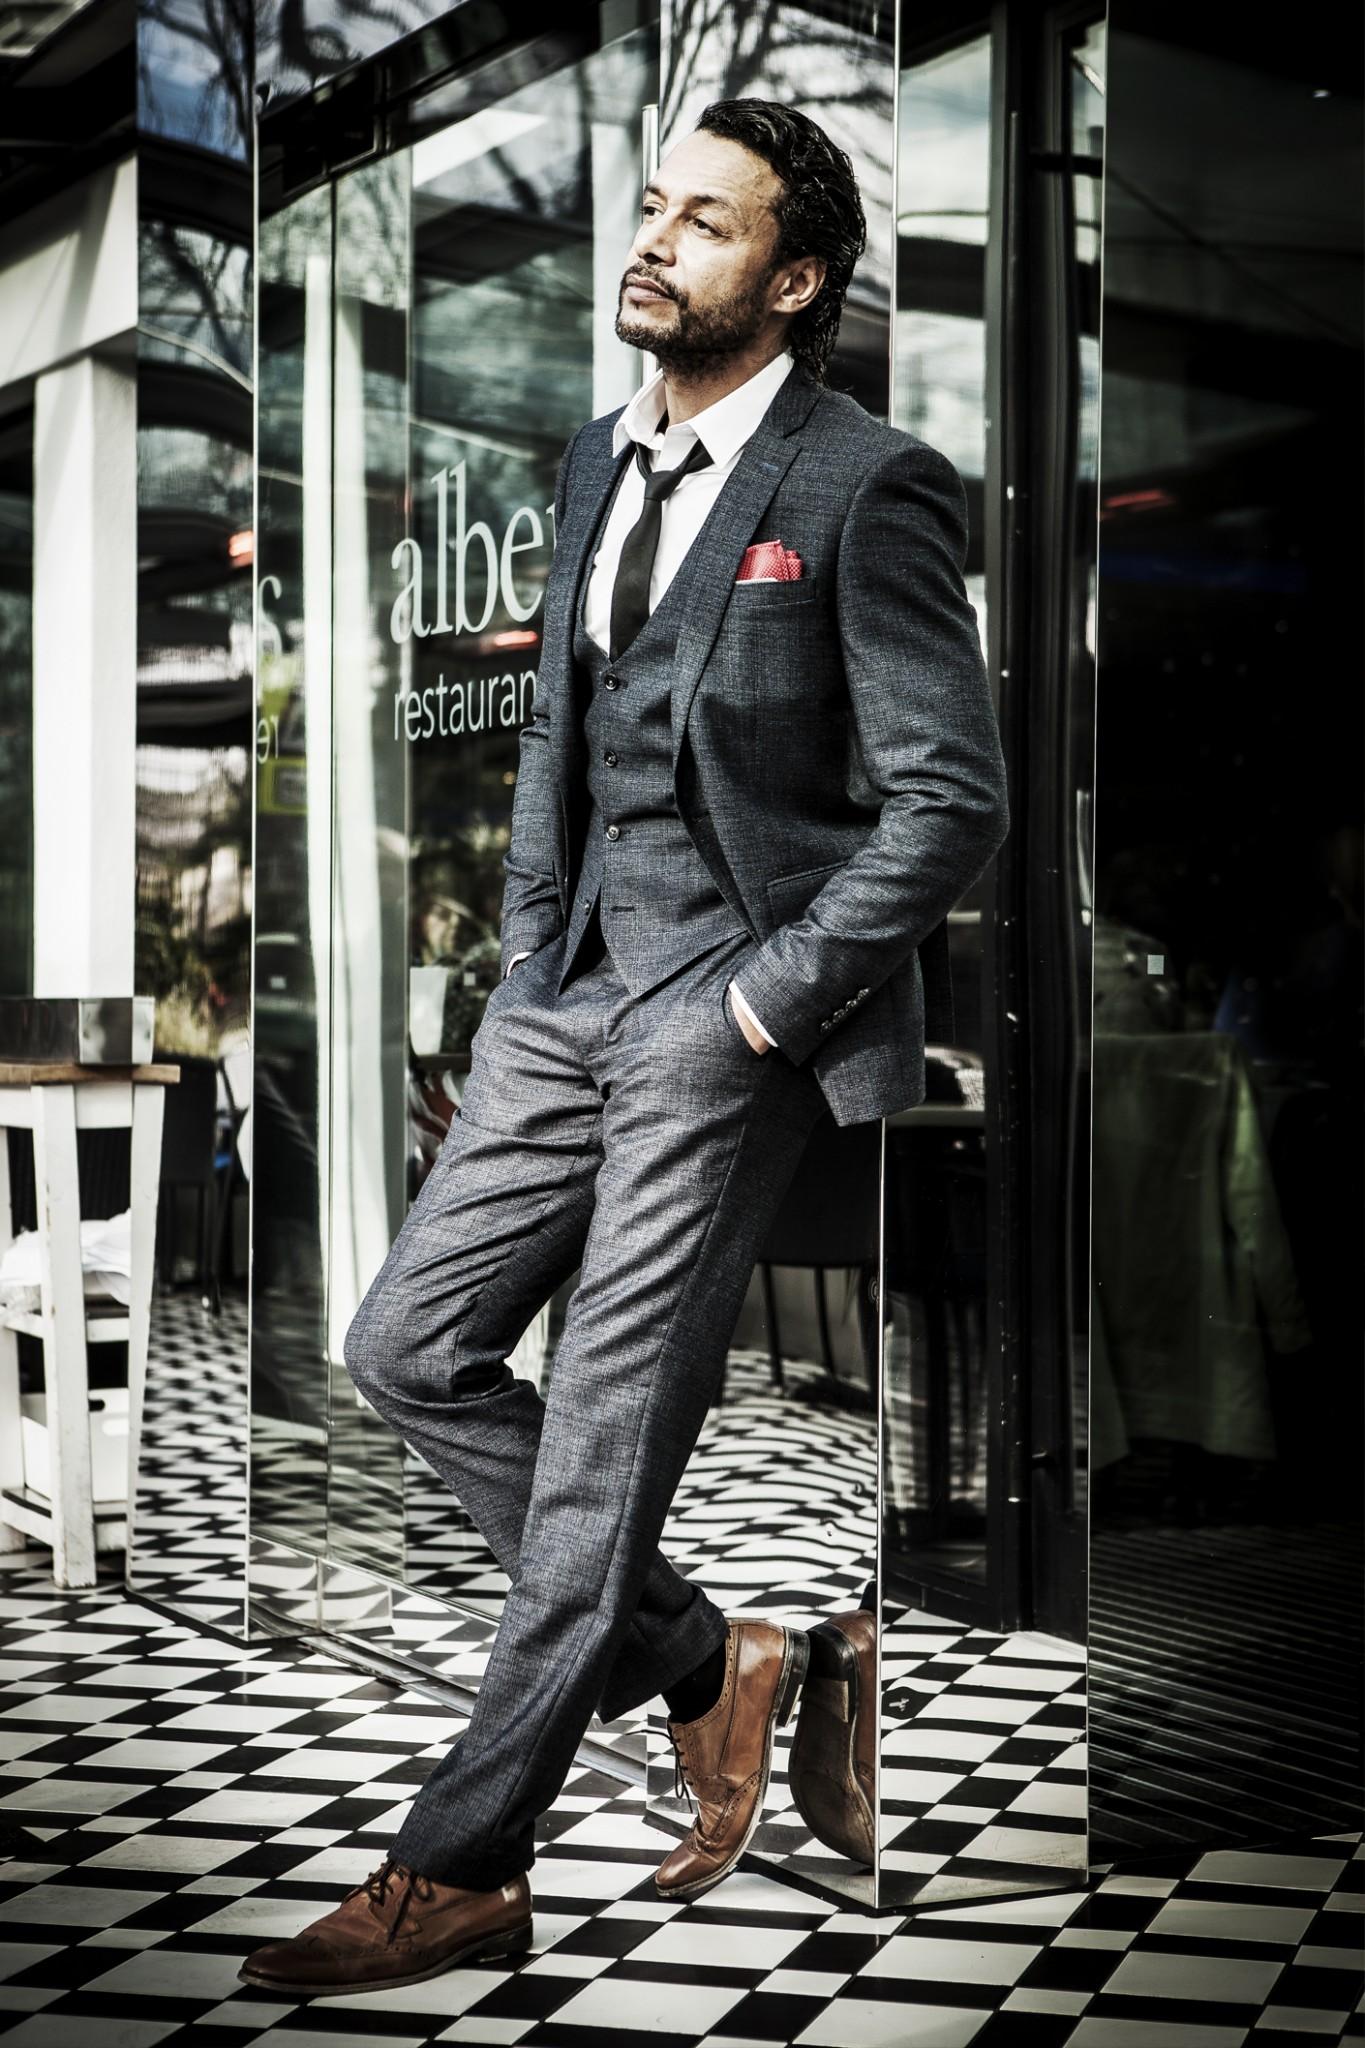 menswear-fashion-photography-shot-on-locatoion-in-didsbury-manchester